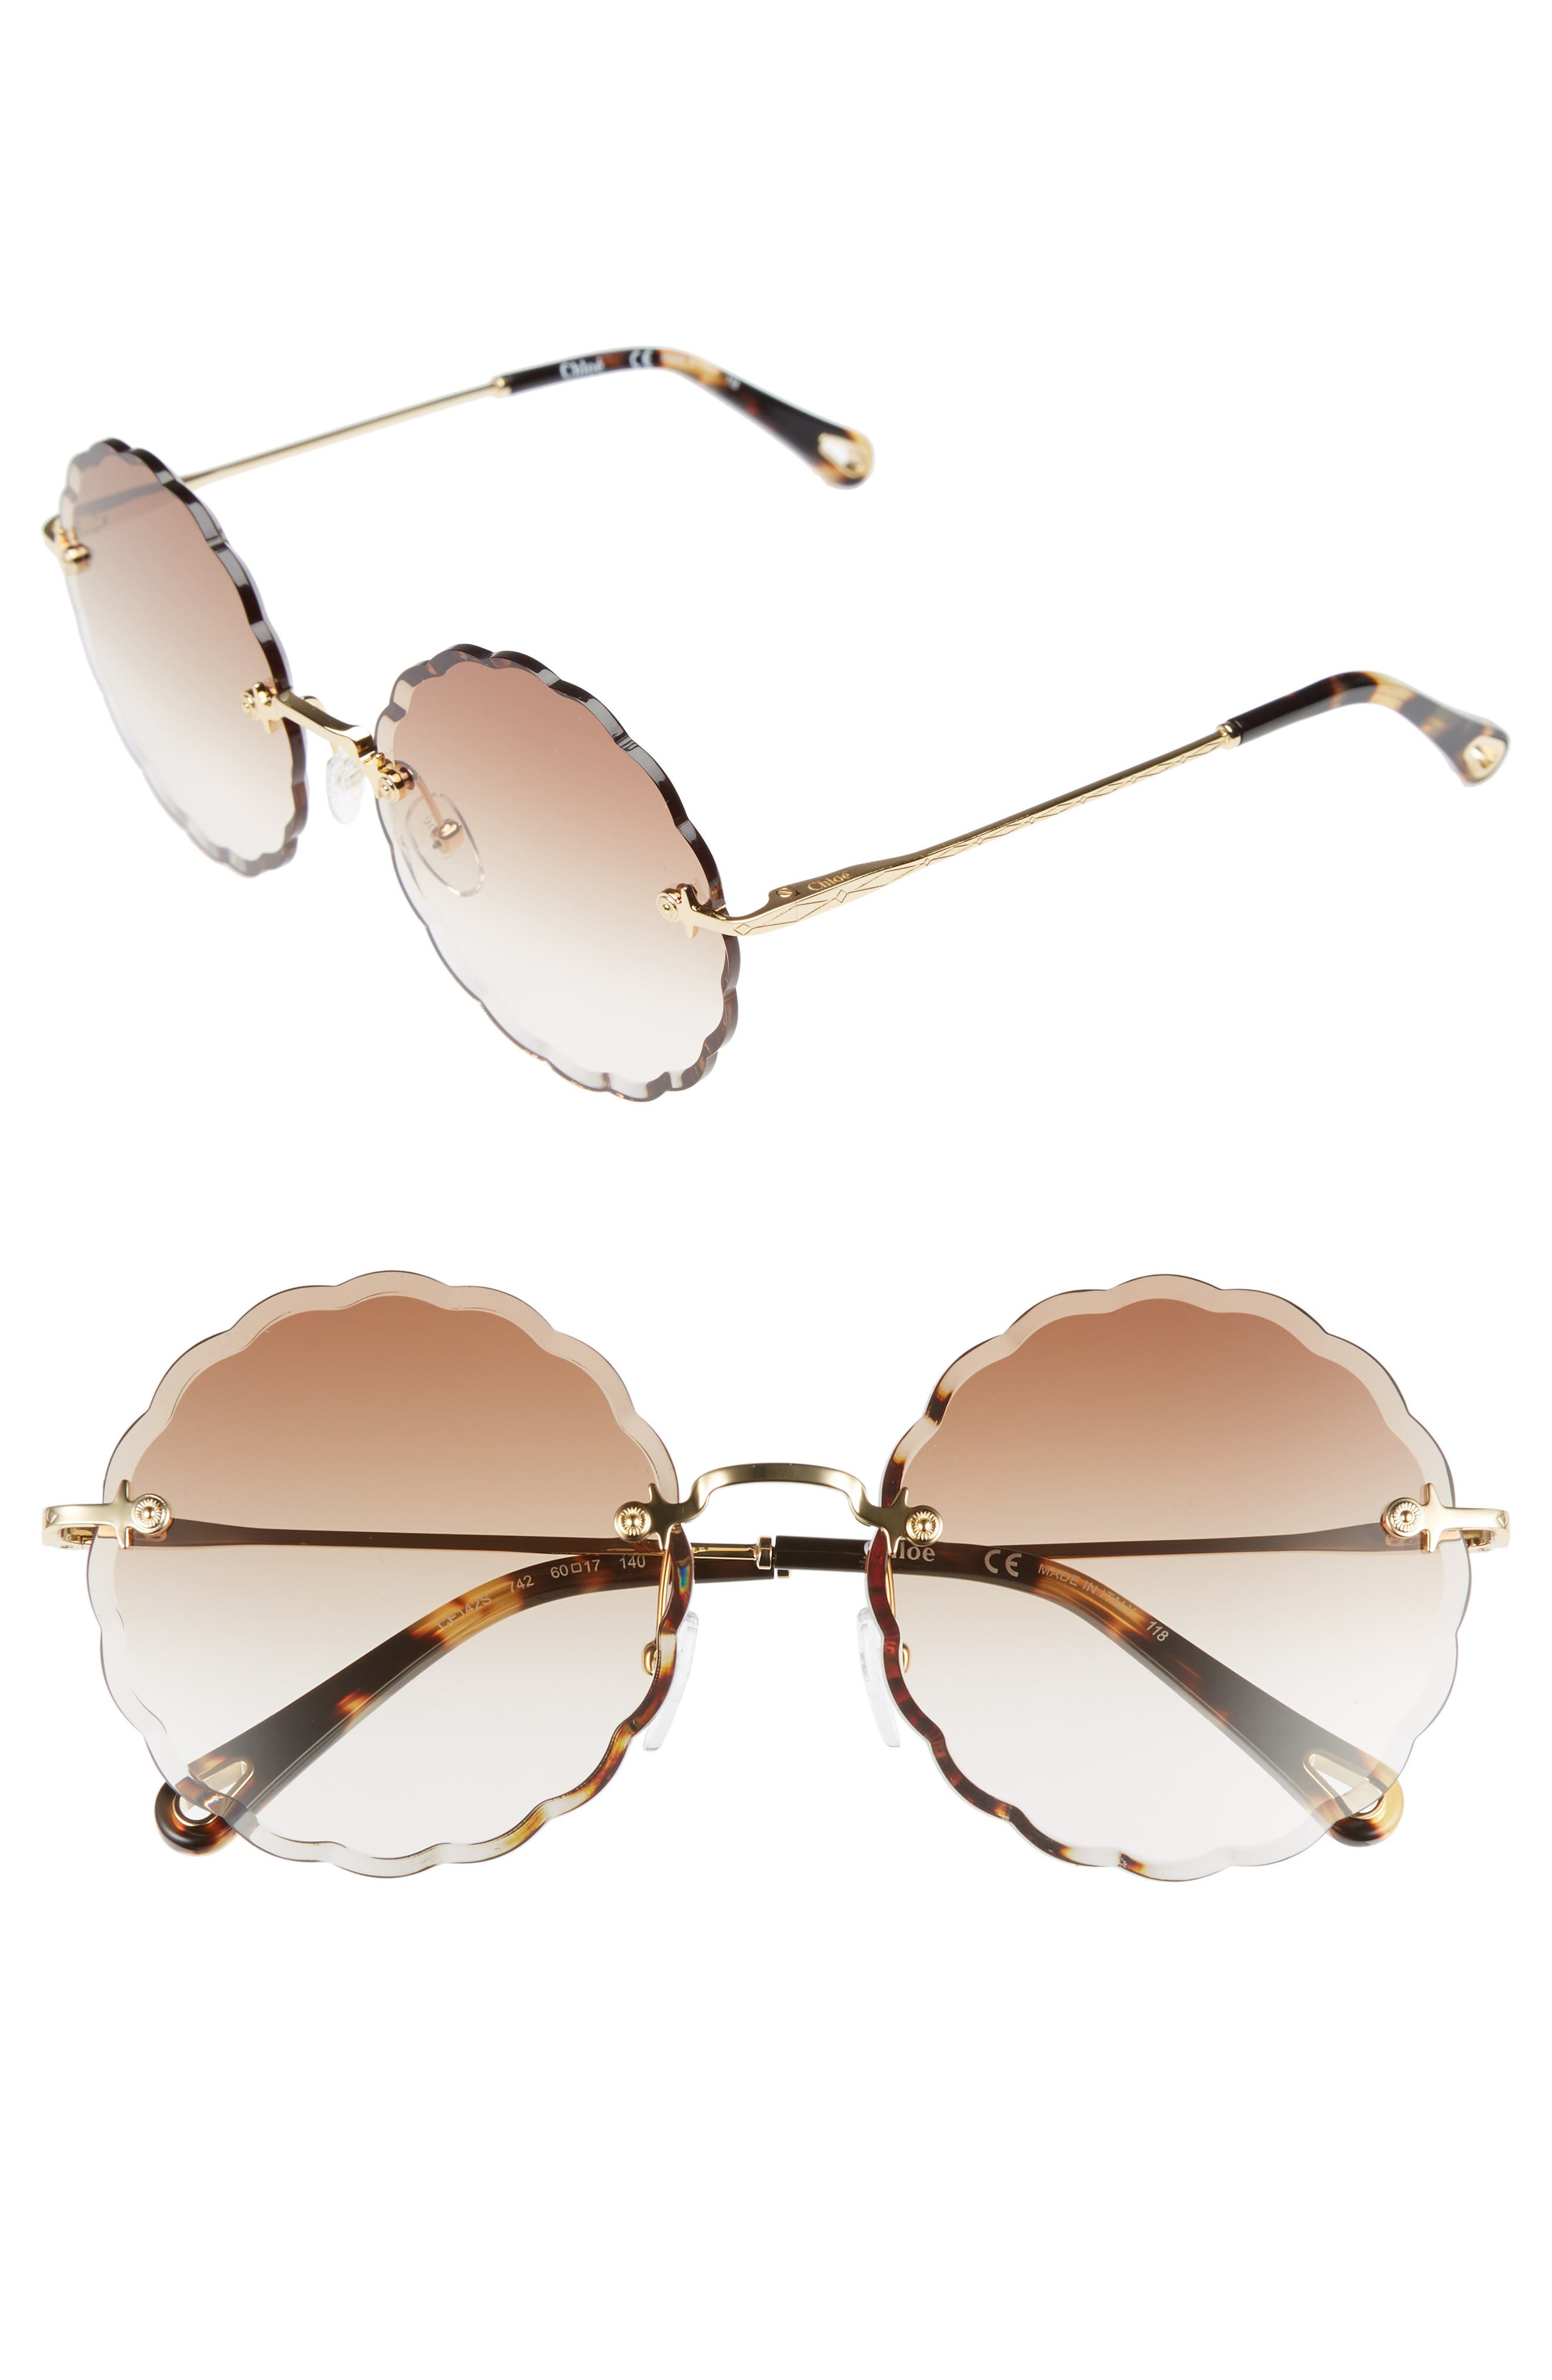 Chloe Rosie 60Mm Scalloped Rimless Sunglasses - Gold/ Gradient Brown